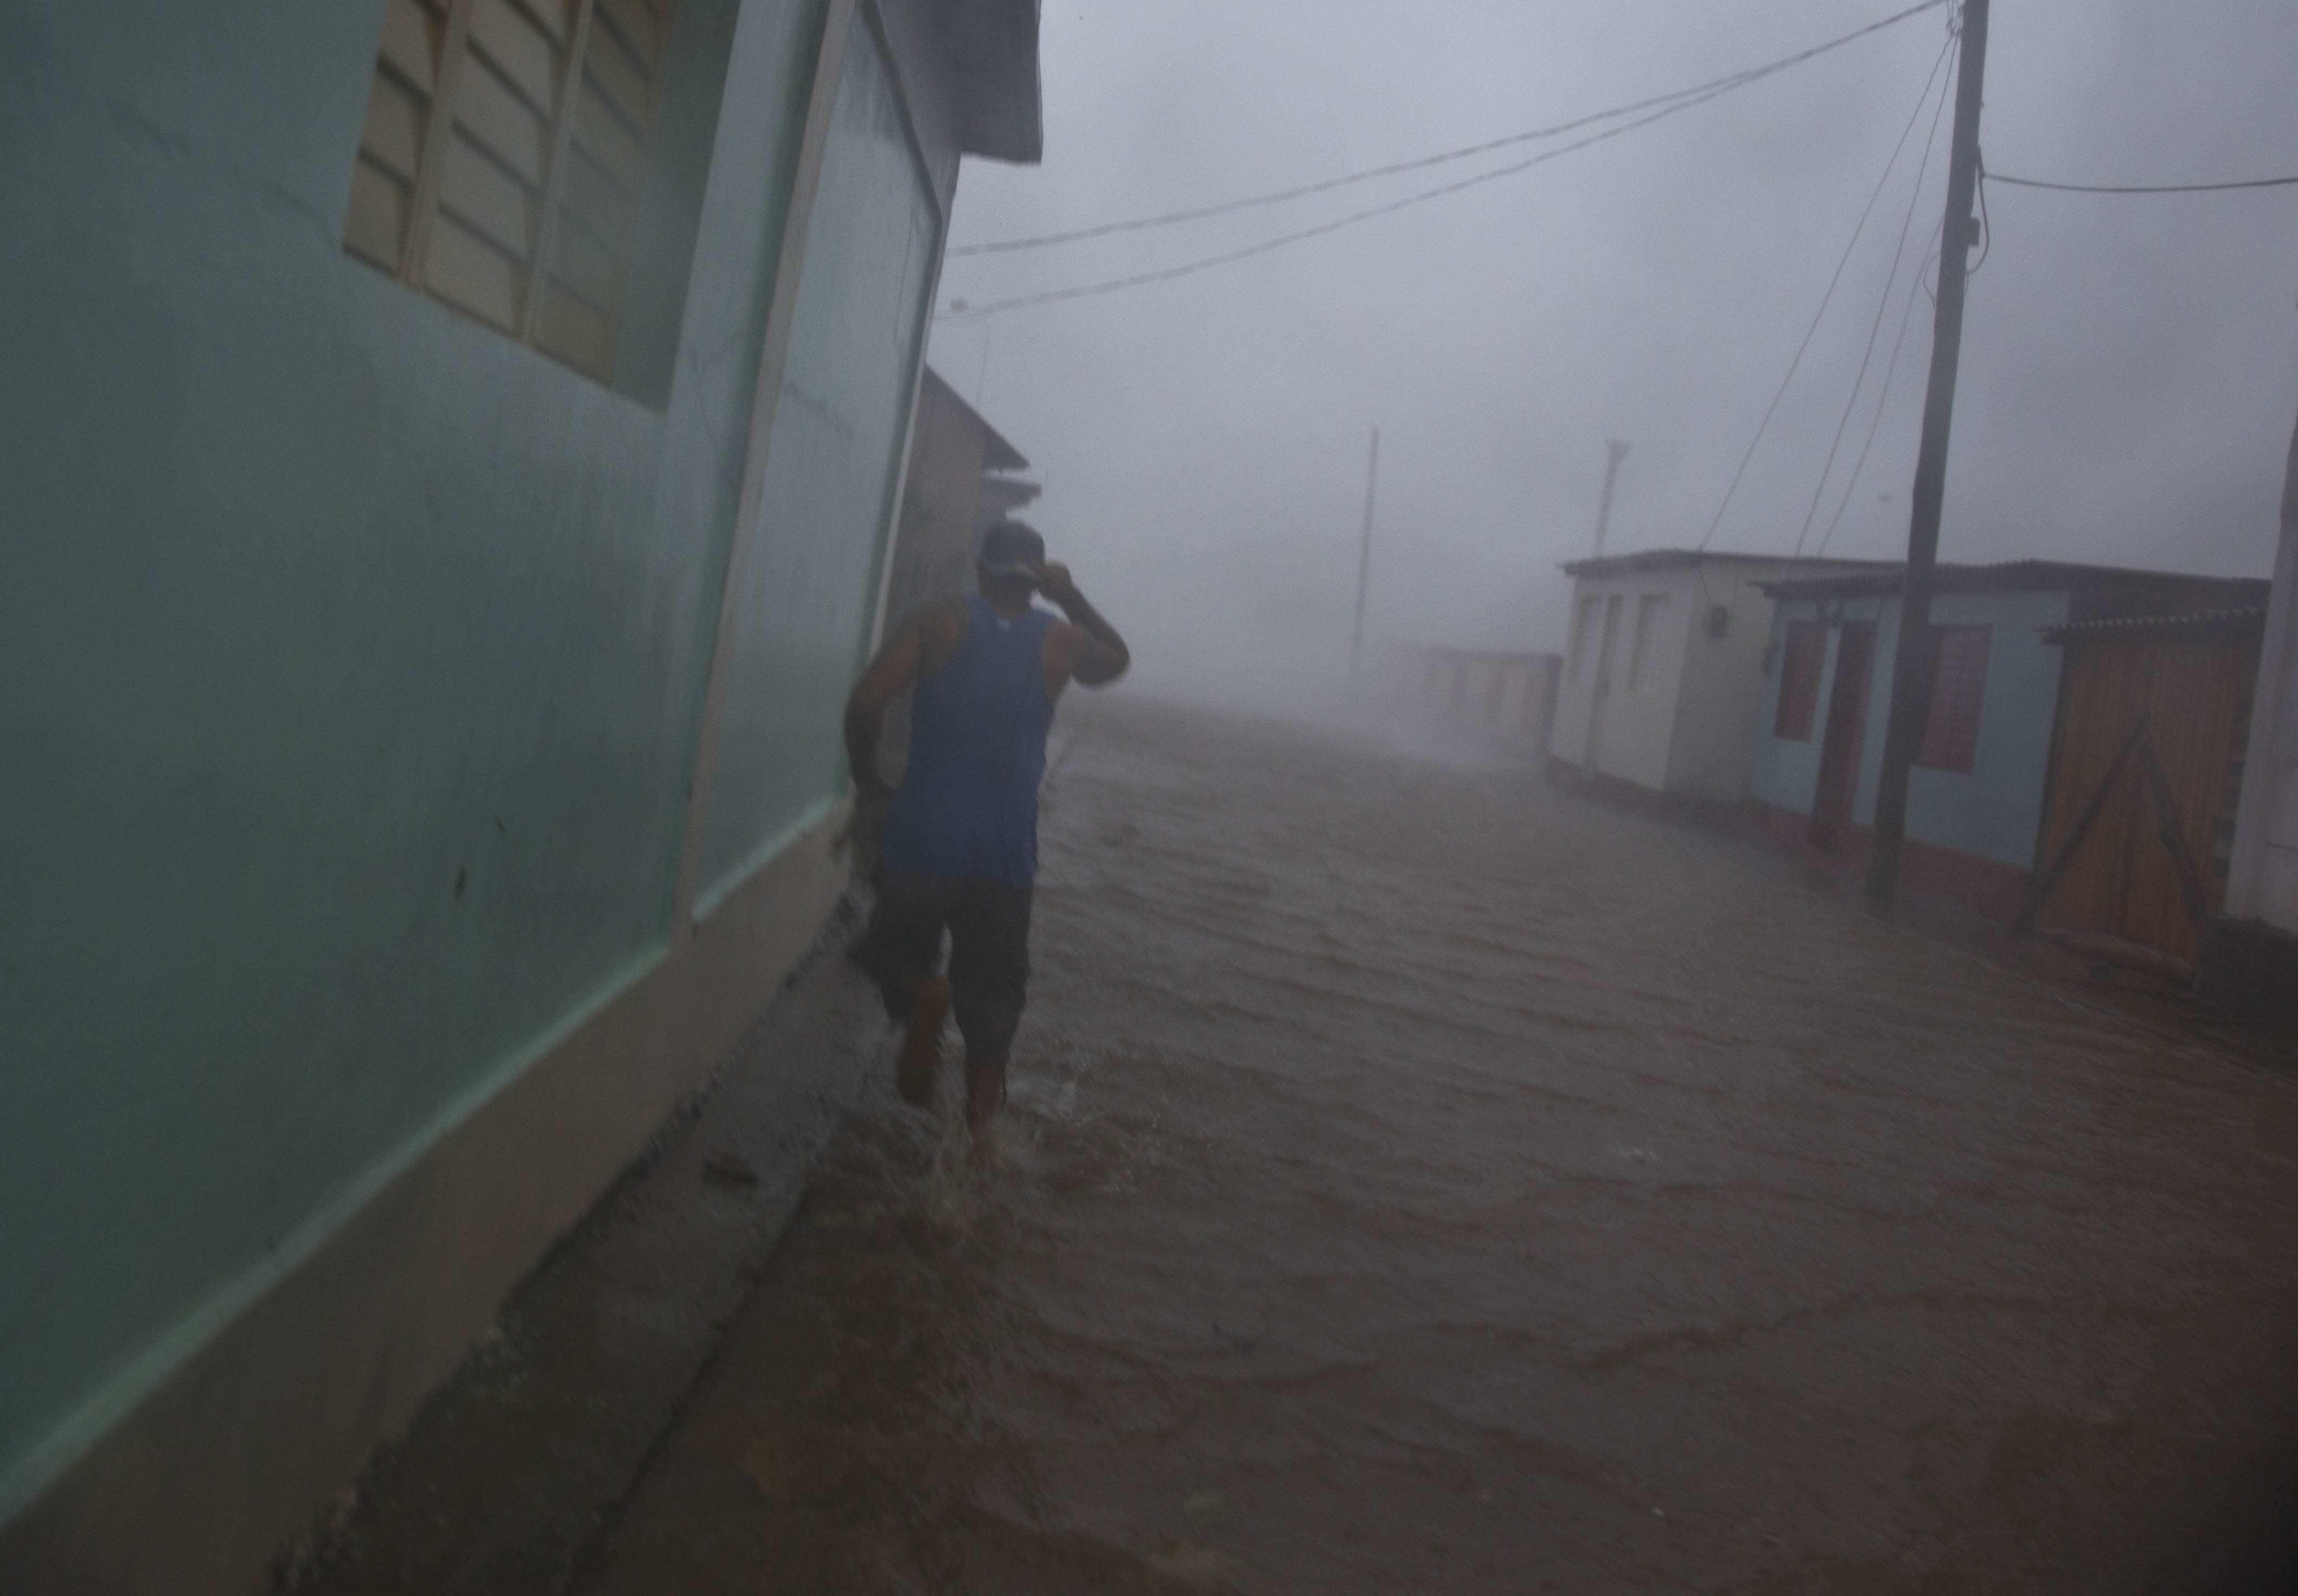 A resident runs in a flooded street as Hurricane Matthew roars over Baracoa, Cuba on Oct. 4, 2016.